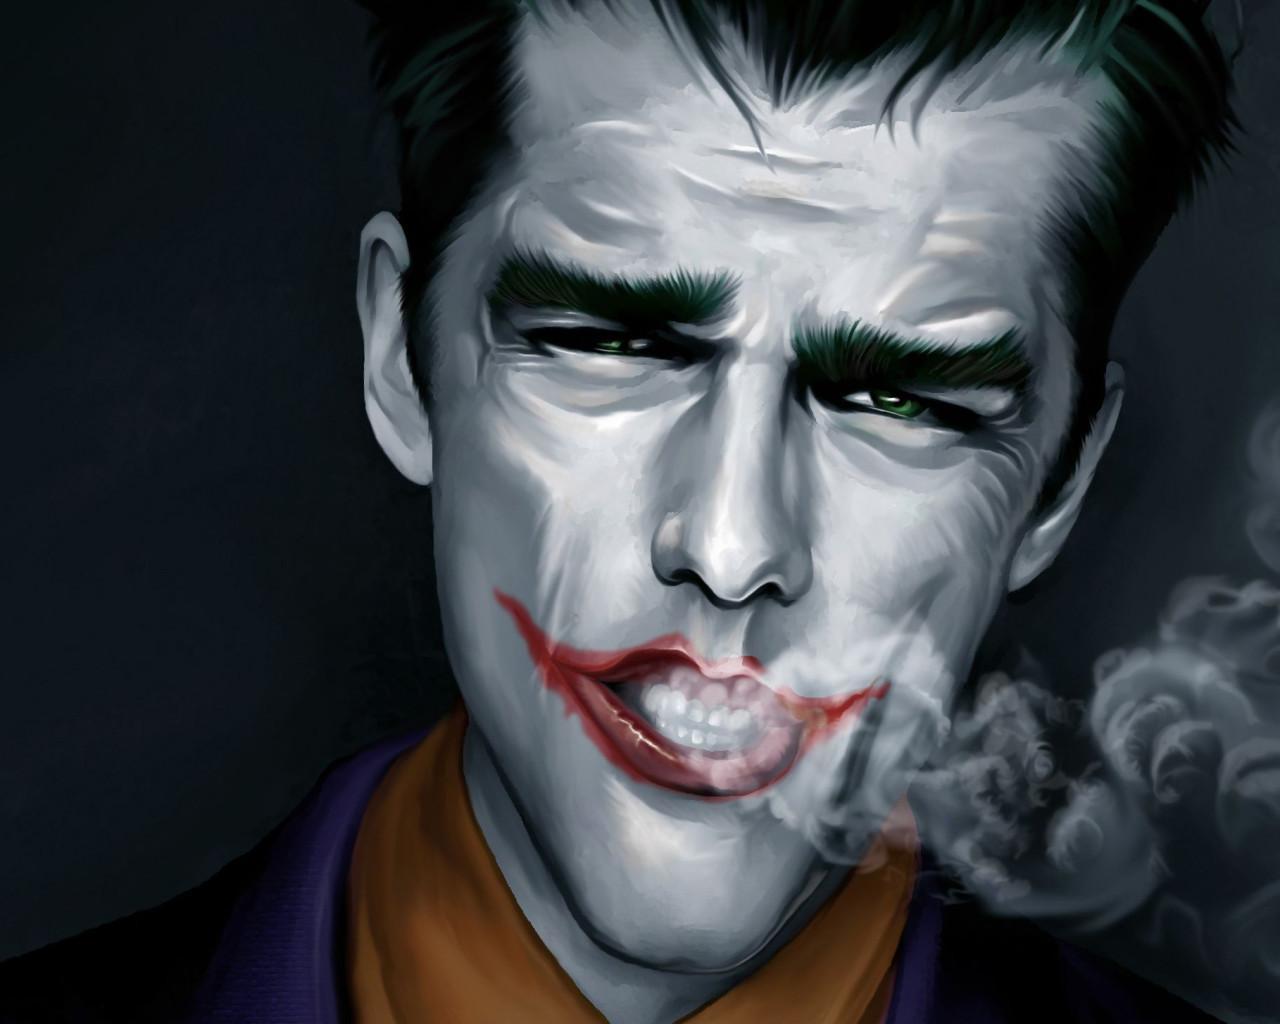 Joker Smoking Wallpapers - Wallpaper Cave